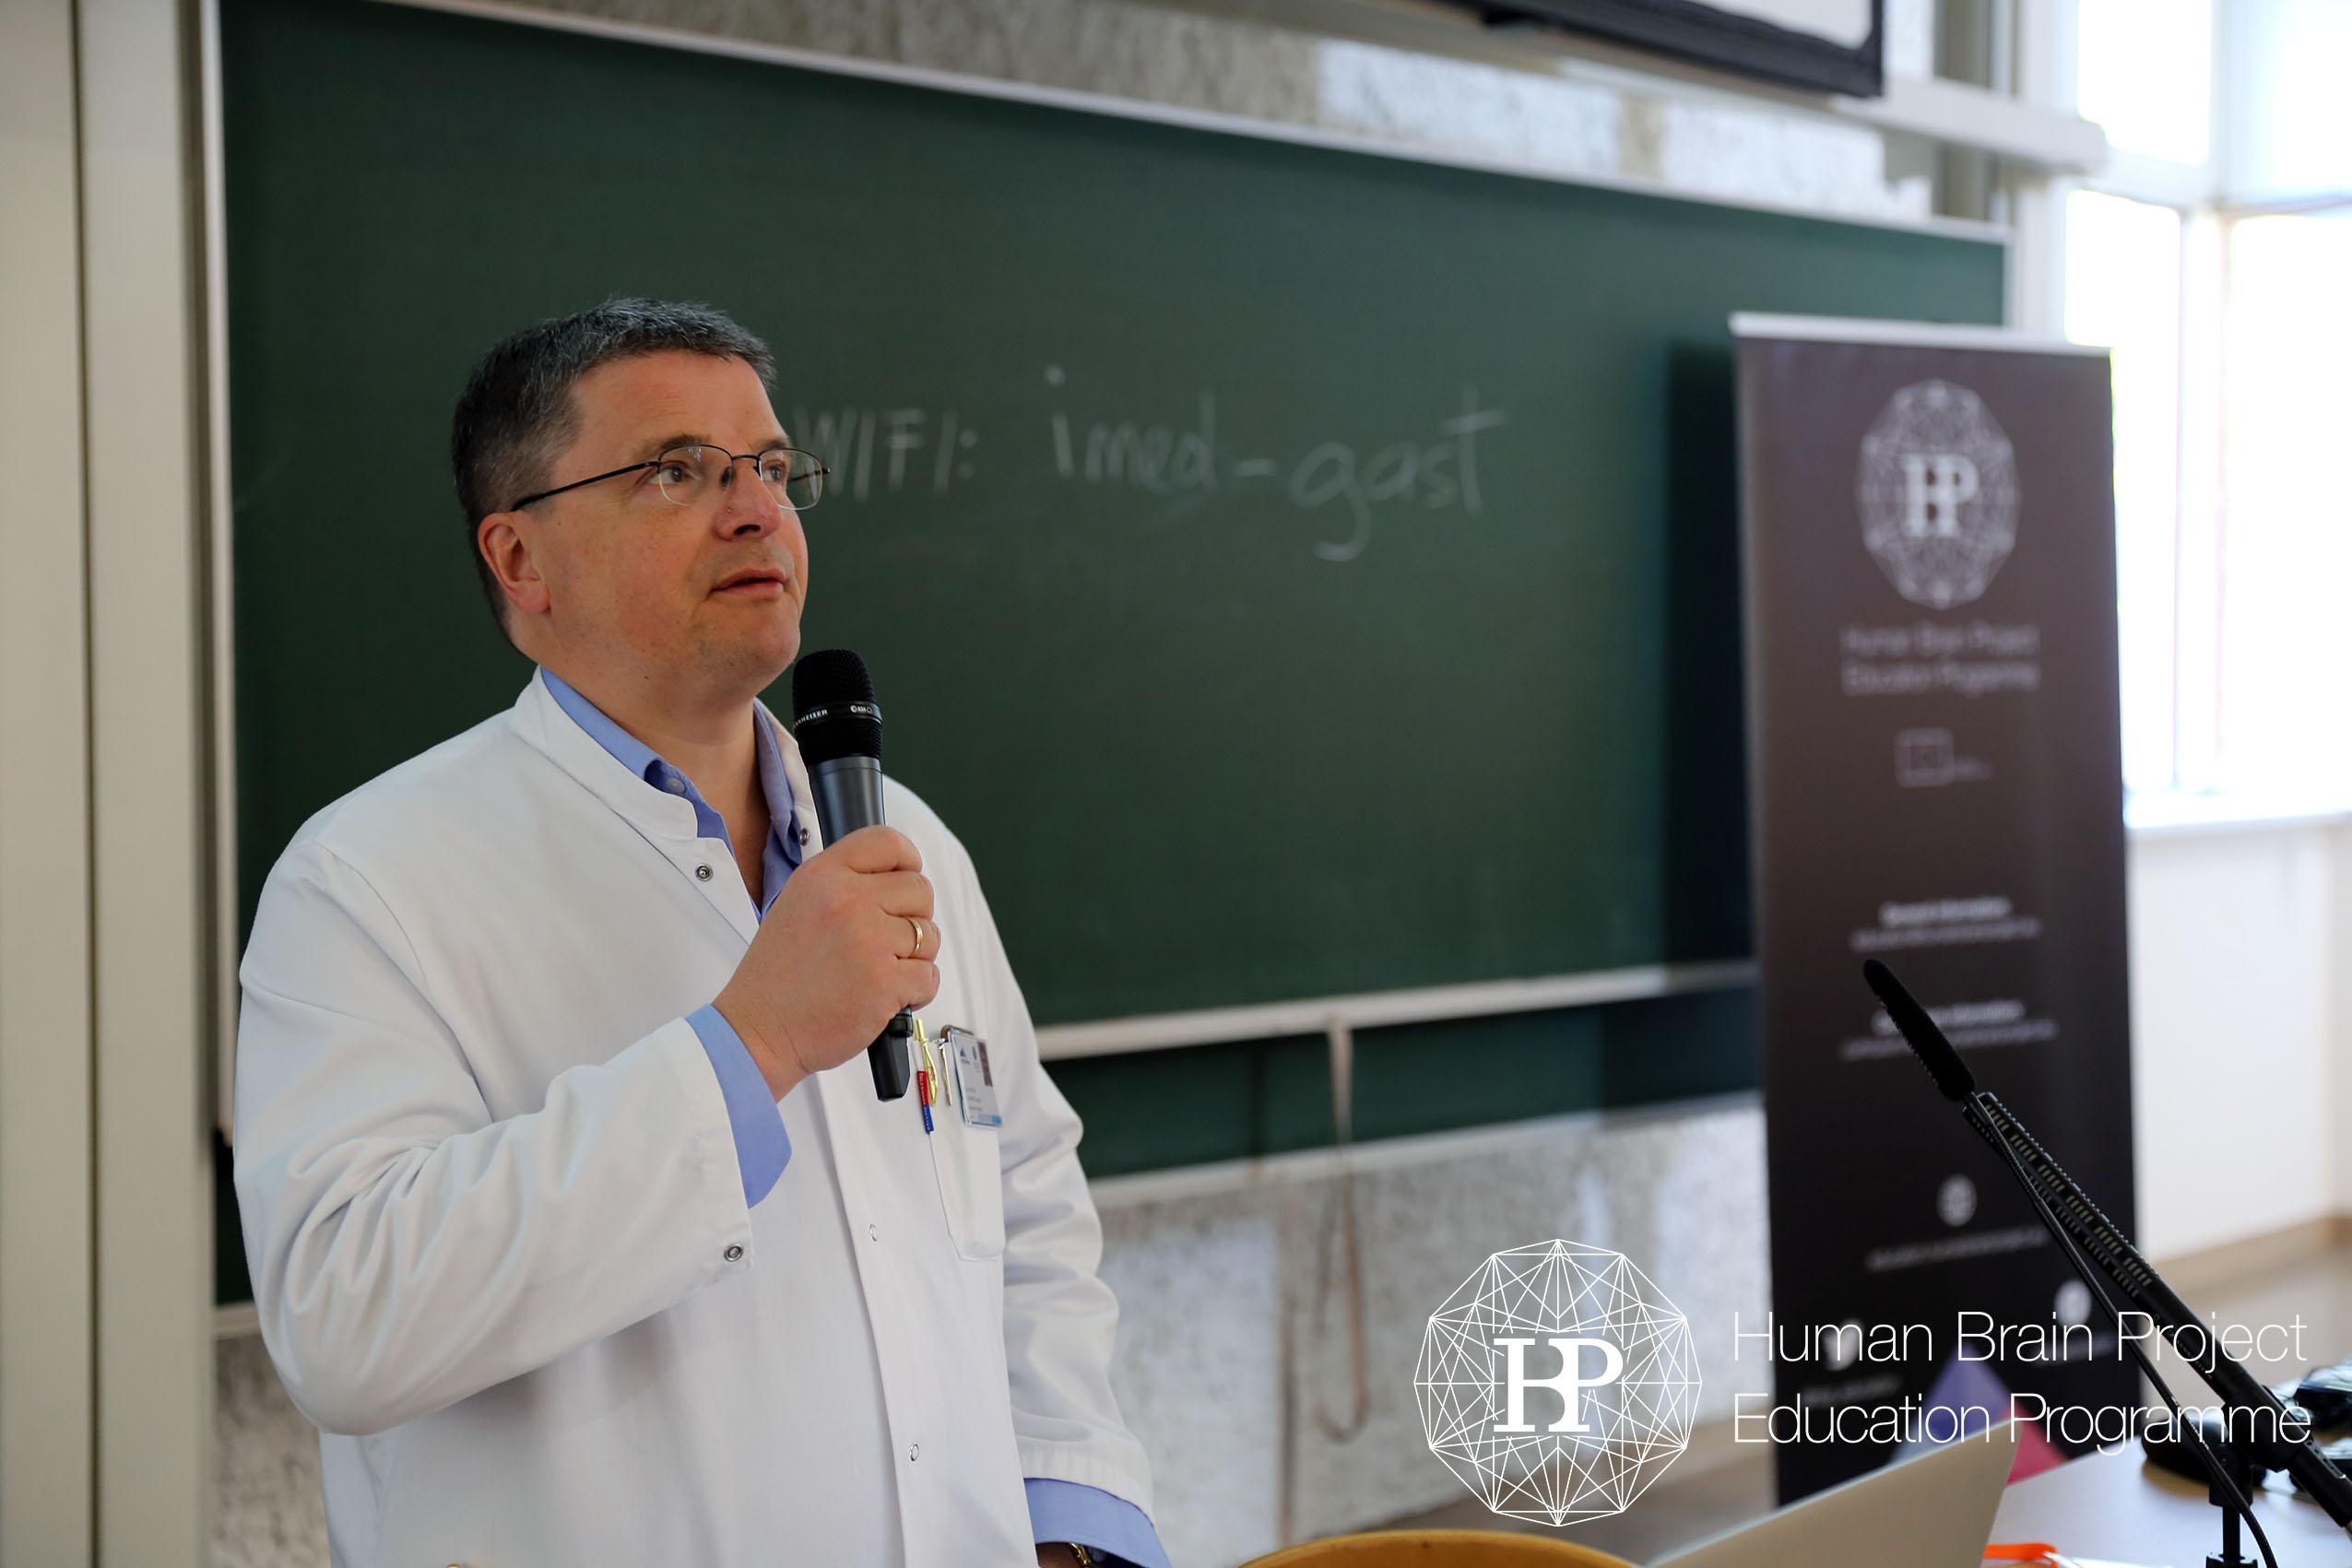 HBP_1st_BrainMedicine_workshop_12.jpg -